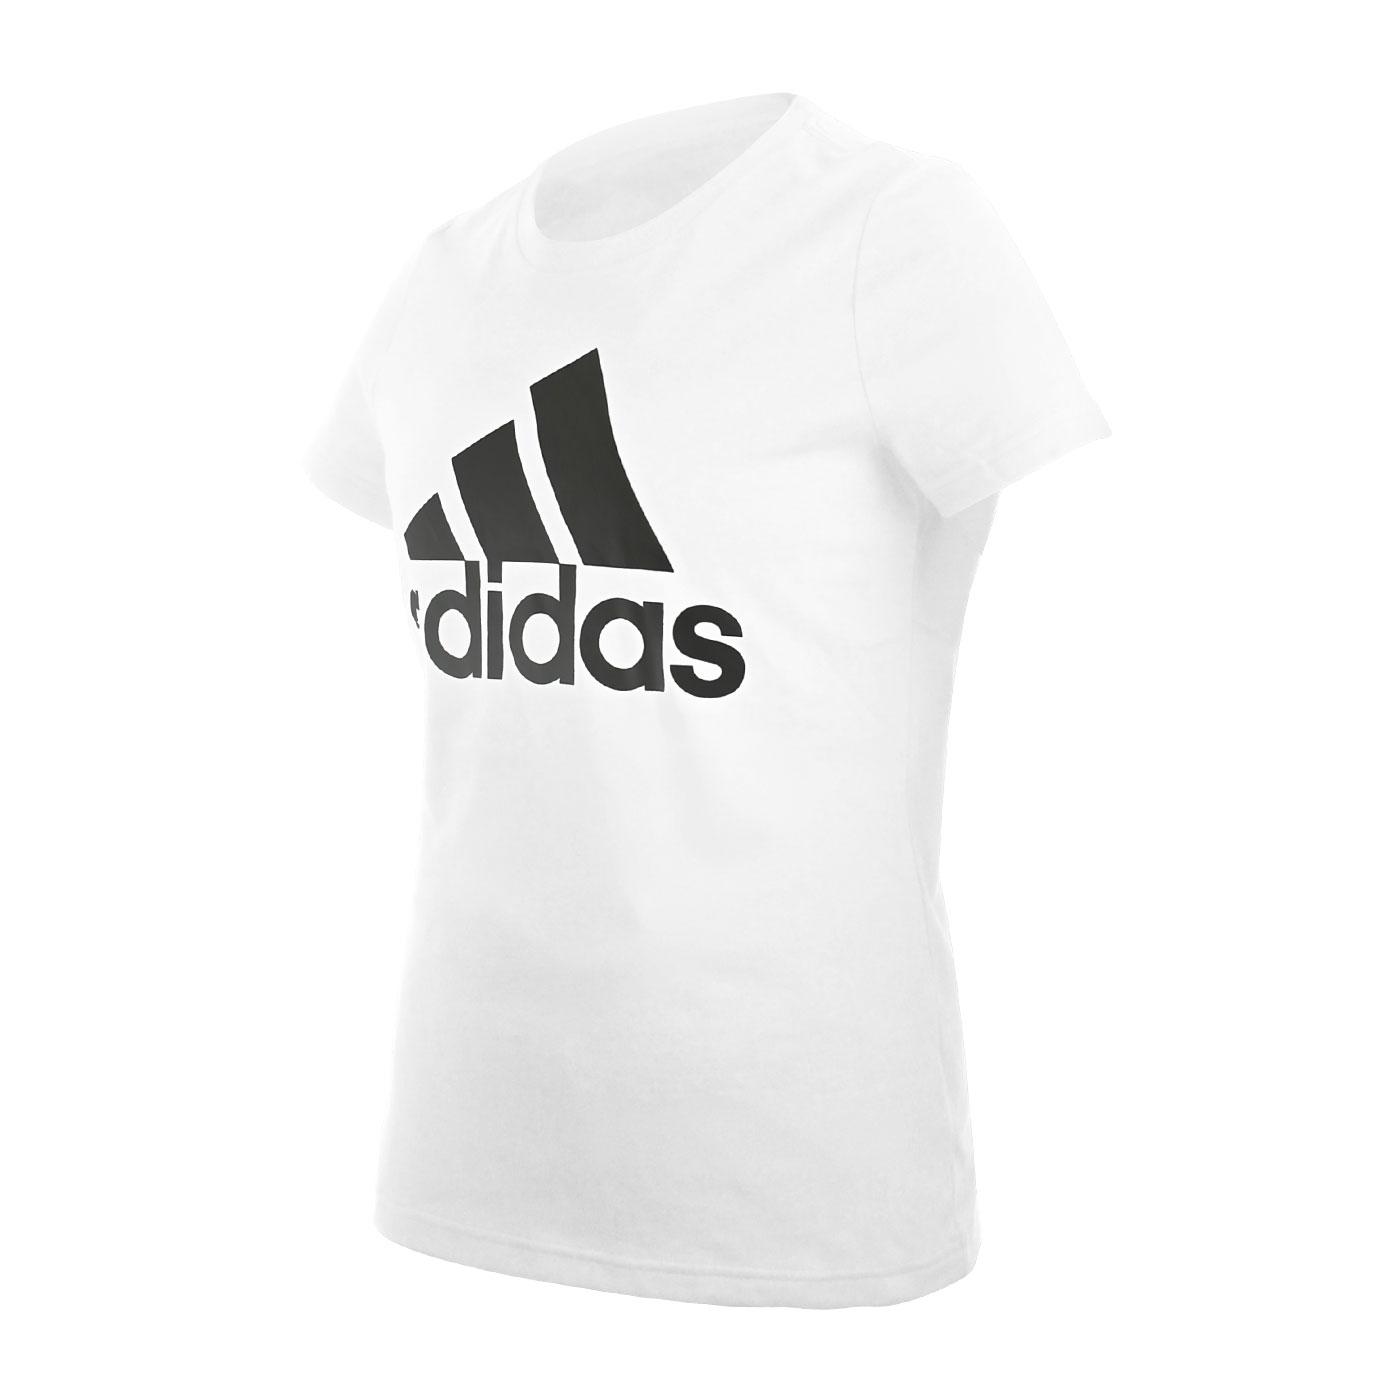 ADIDAS 女款短袖T恤 FQ3237 - 白黑